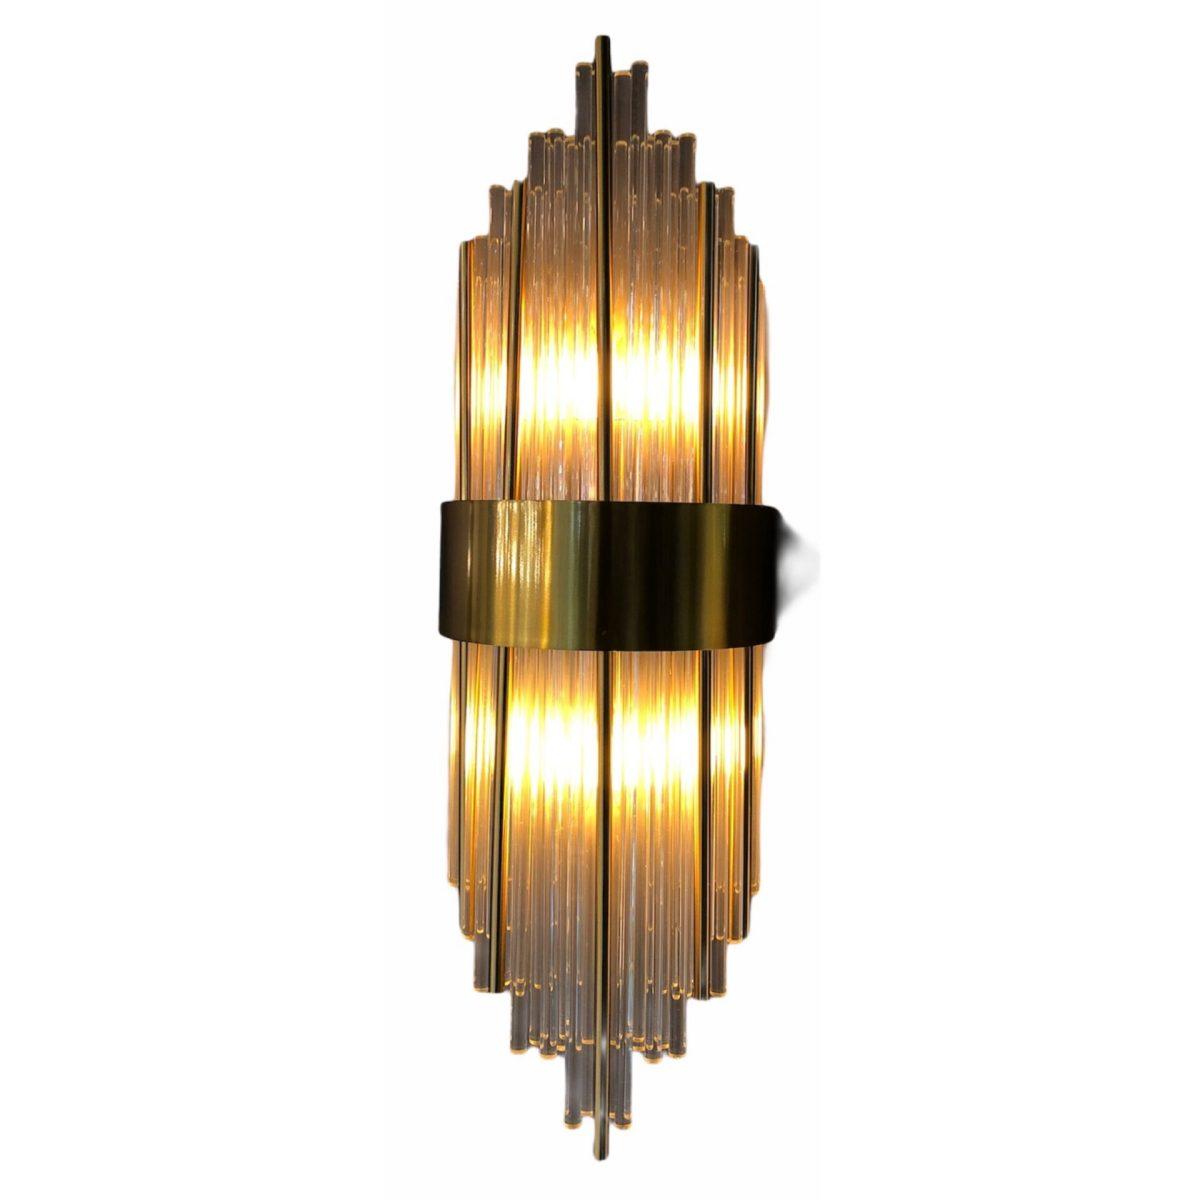 Art Deco Wall Light